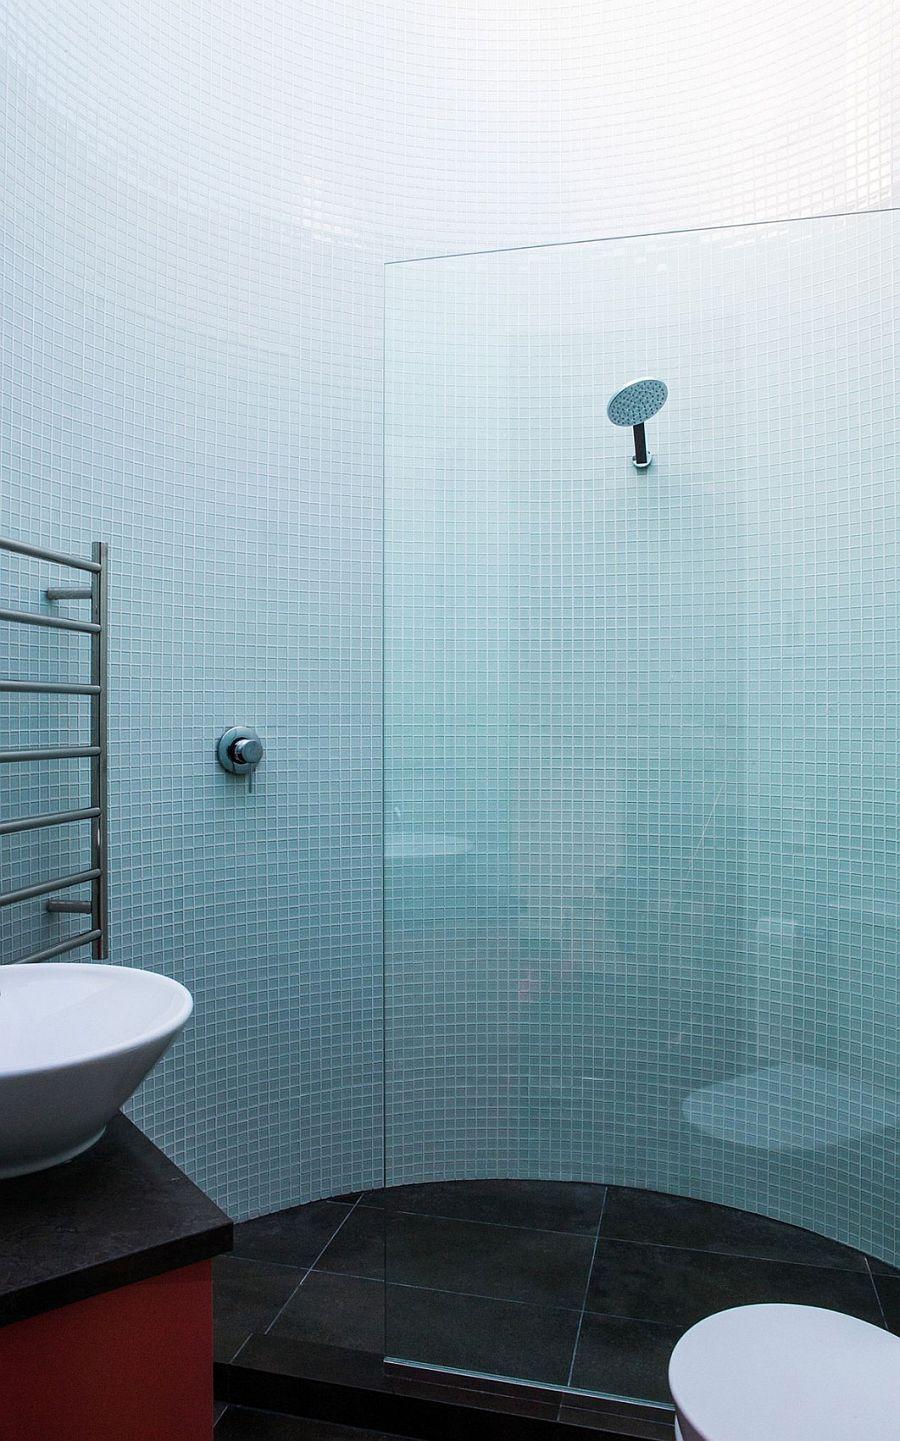 Bathroom with ombre walls